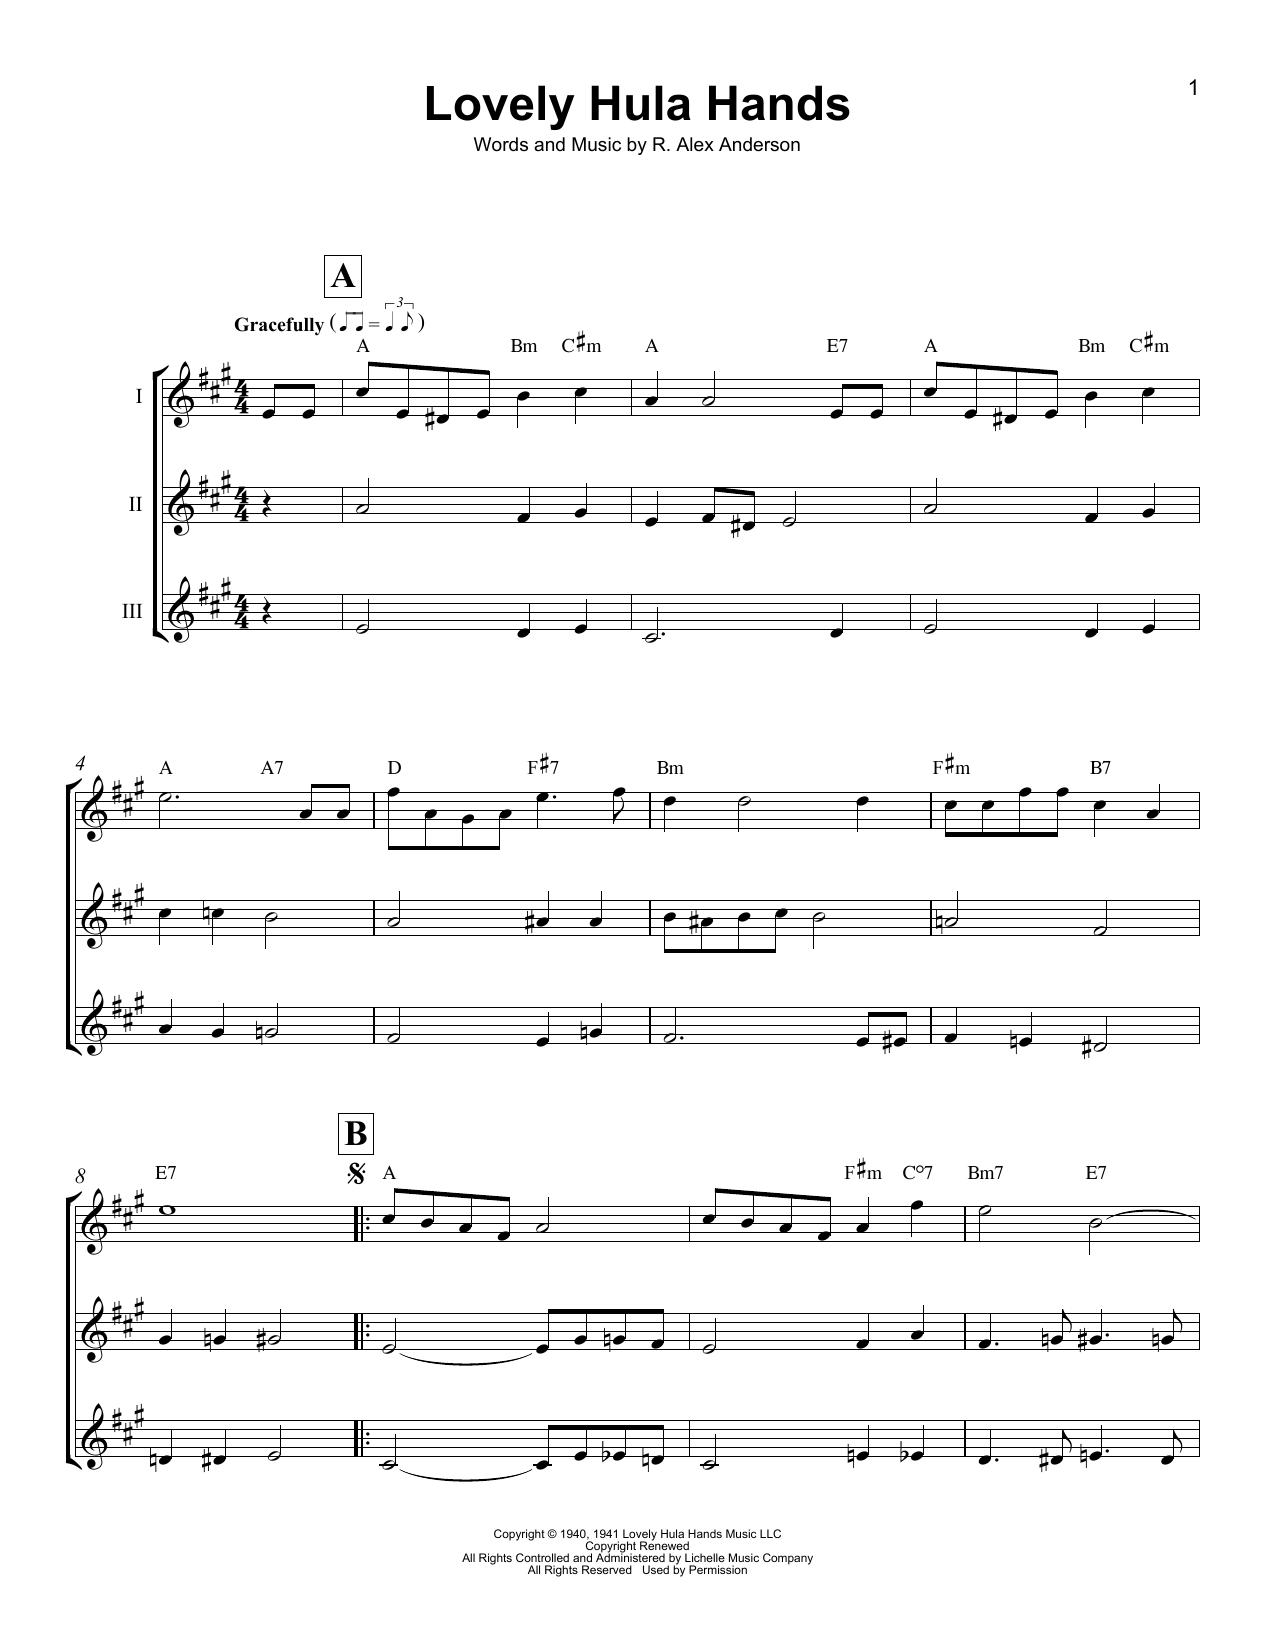 Lovely Hula Hands Sheet Music